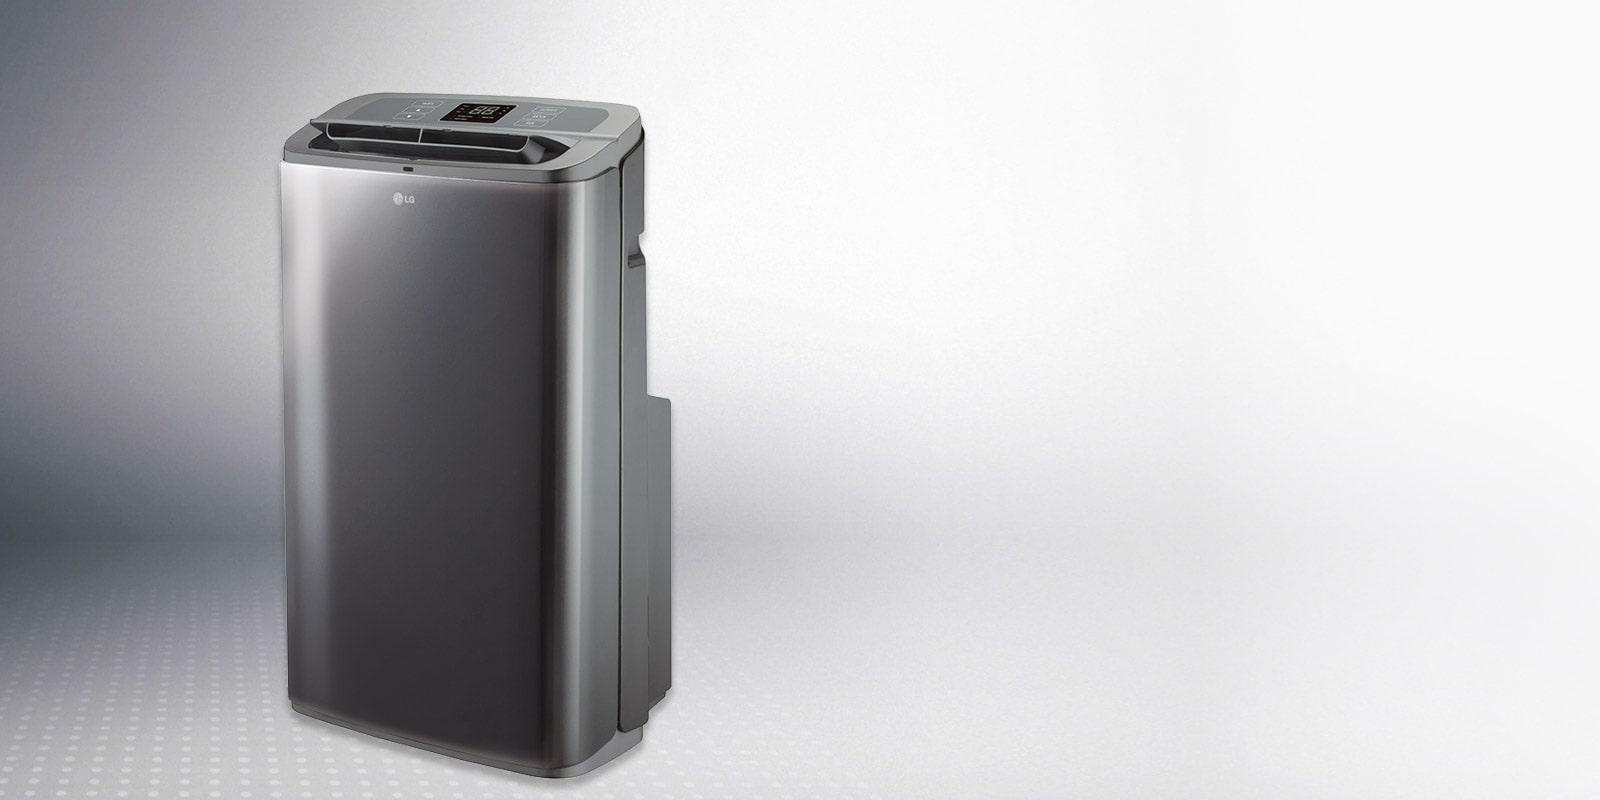 LG Air Conditioners & Air Conditioning Units | LG Sri Lanka